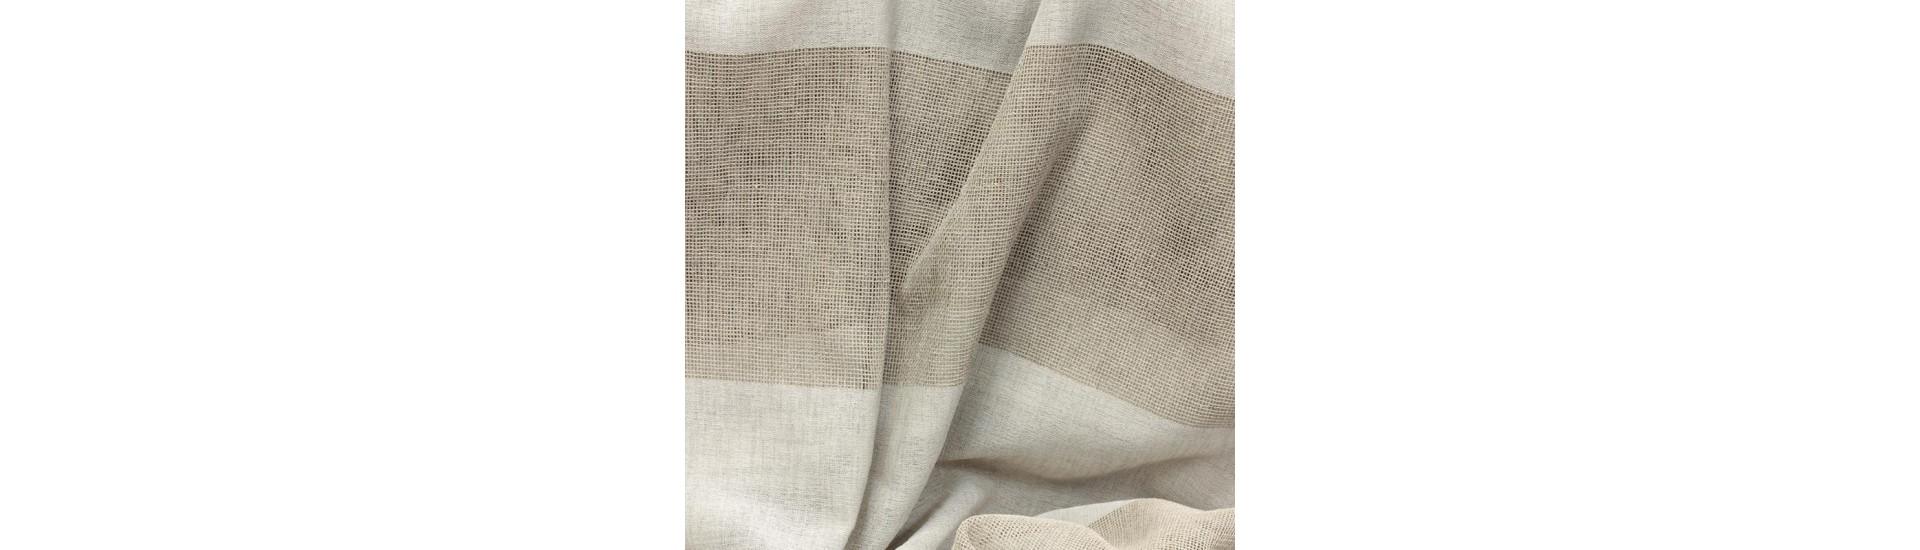 Ткань для штор имитация льна 5752/ZB09 SETKA TUL высота 310 см (~40 м)